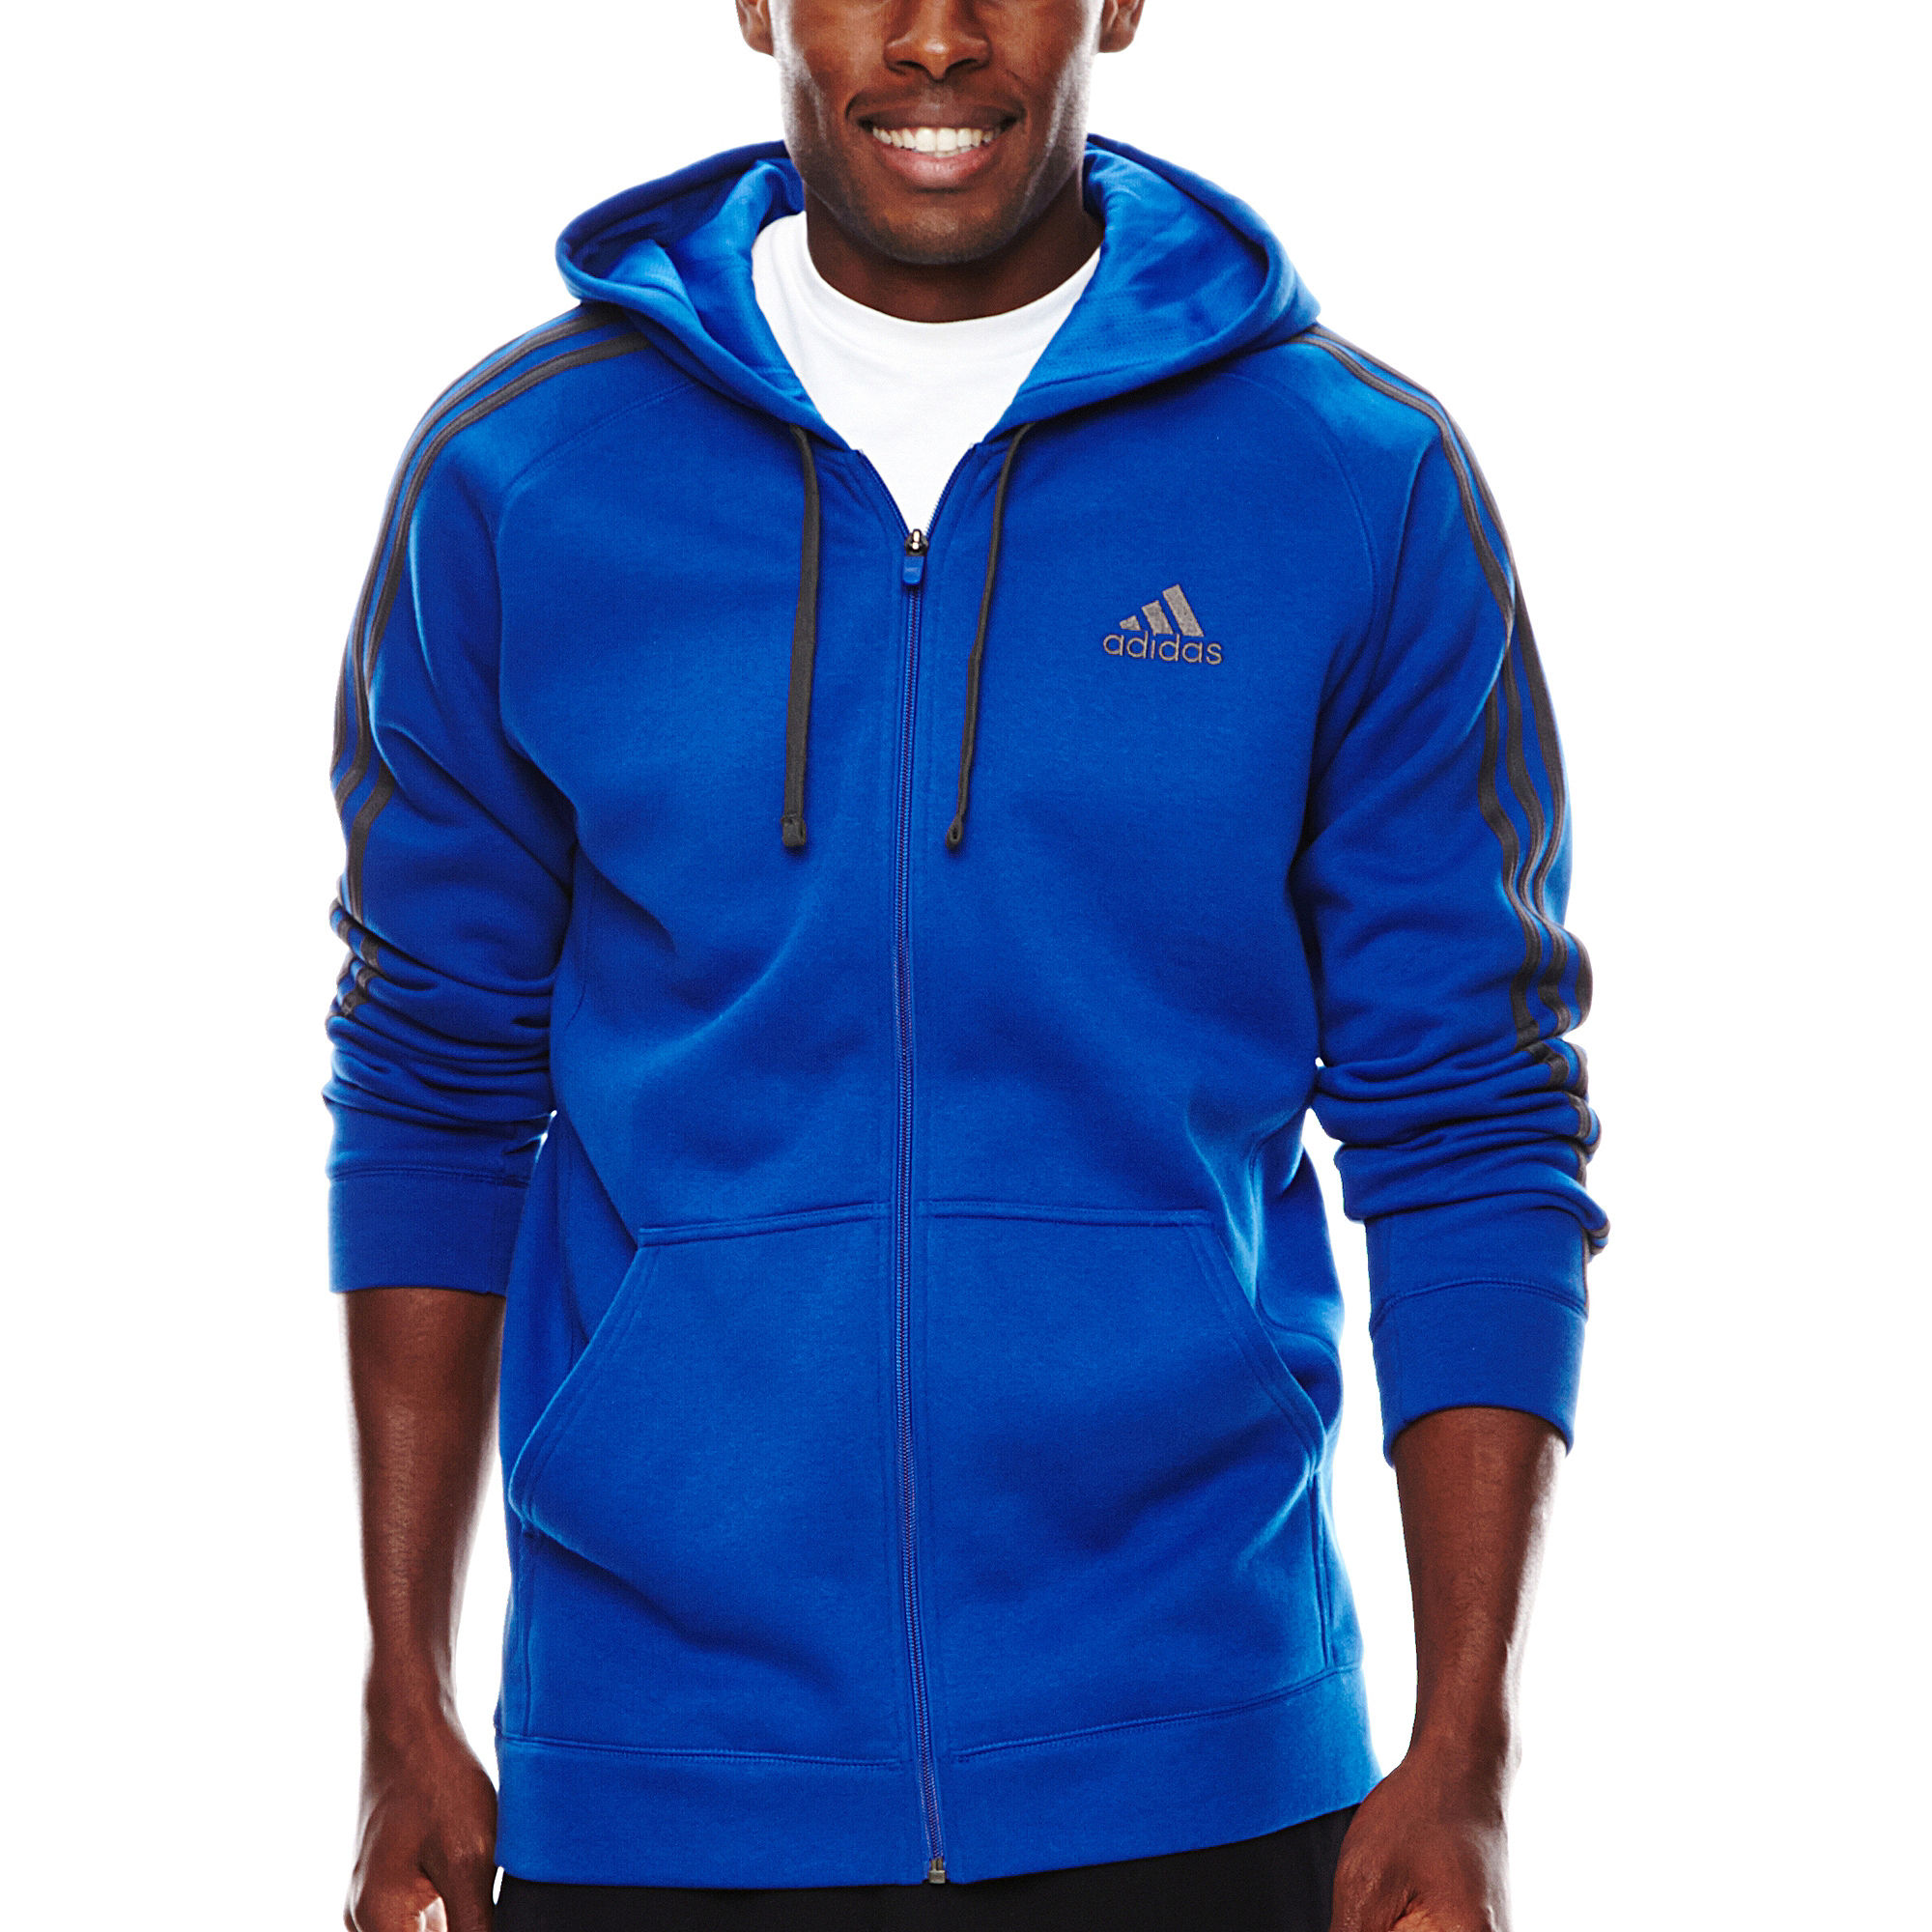 buy online c7c53 83361 UPC 888590538284 product image for adidas Essential Cotton Full-Zip Fleece  Hoodie  upcitemdb.